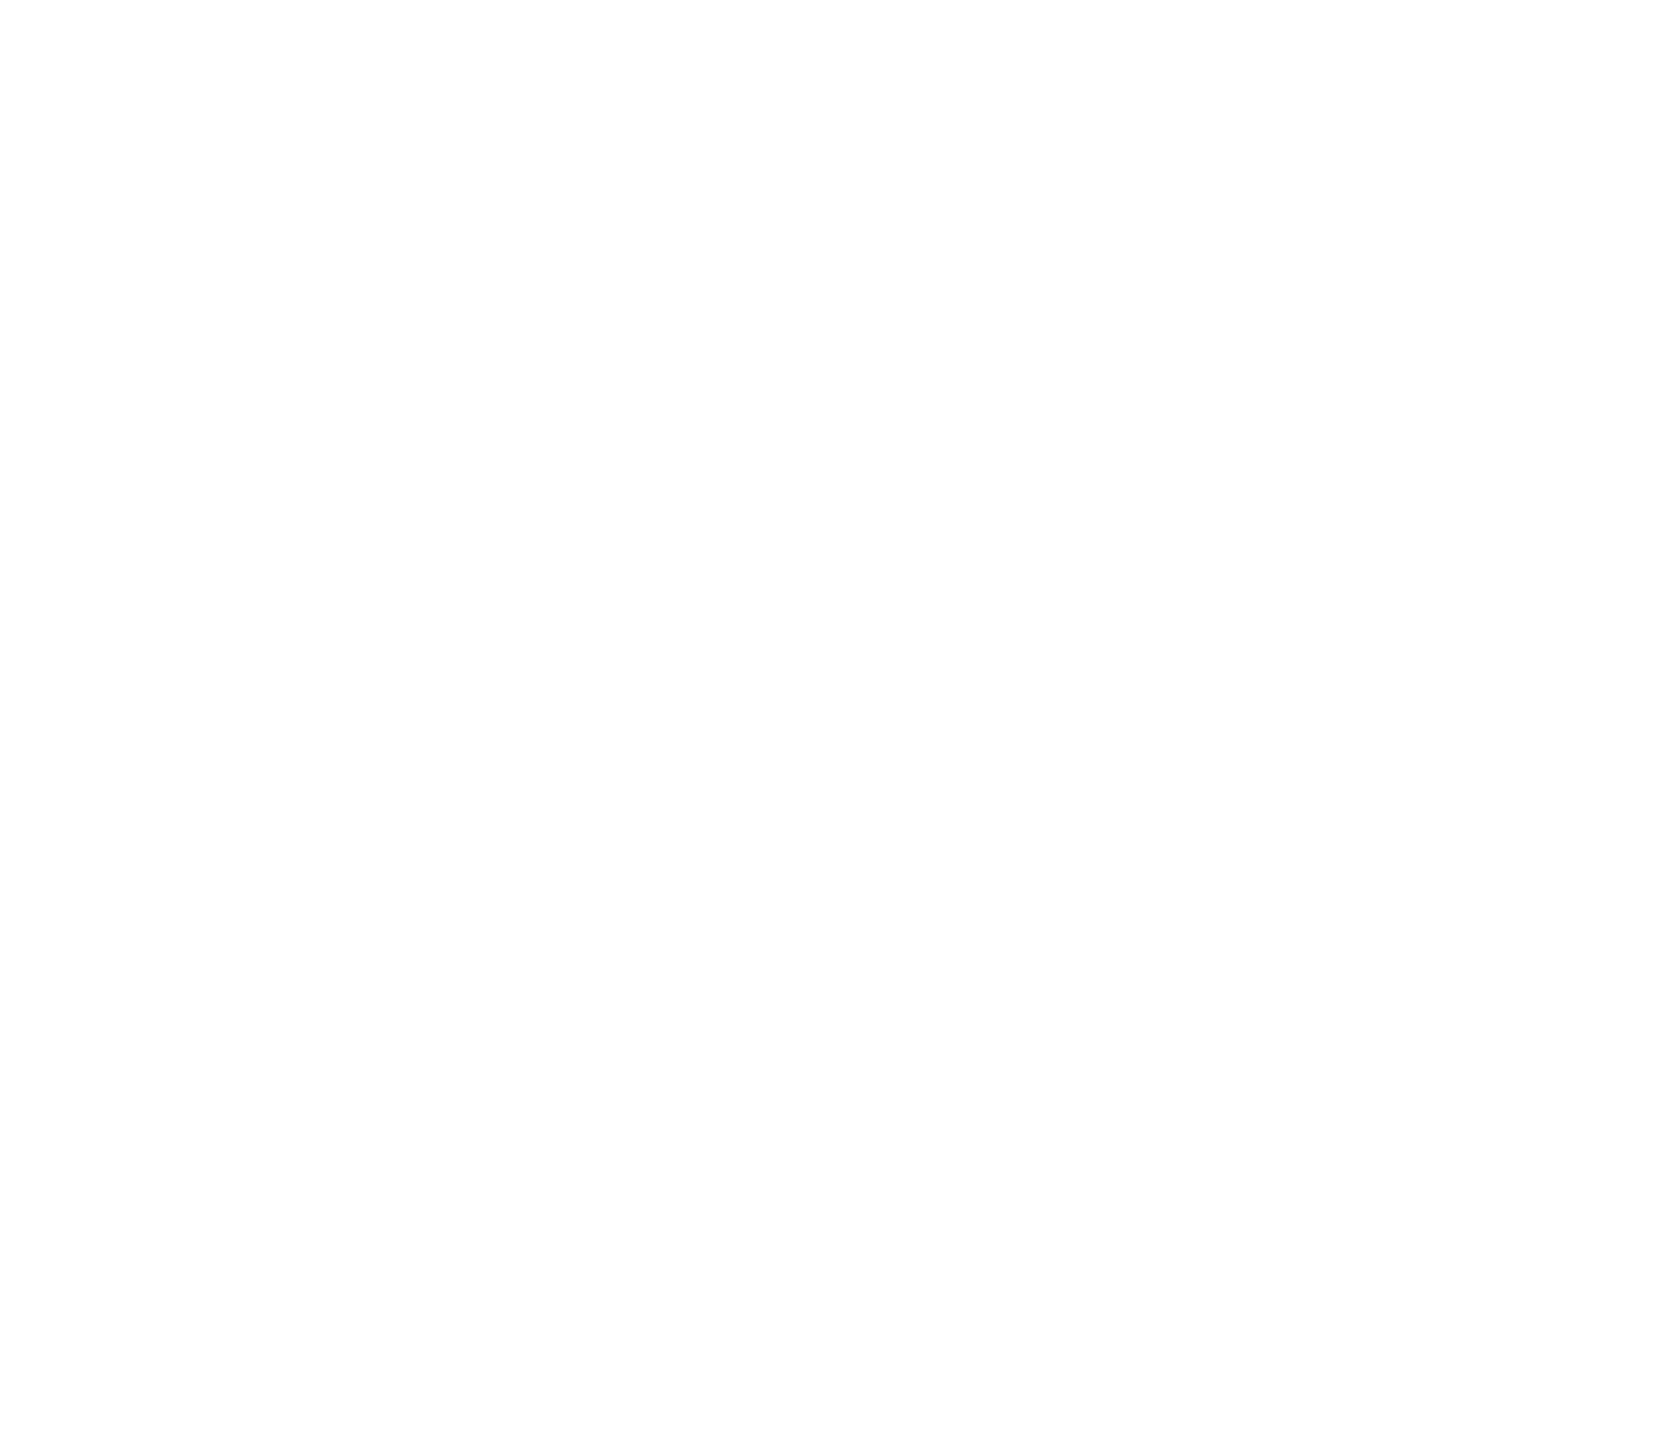 Коттеджный поселок Облака